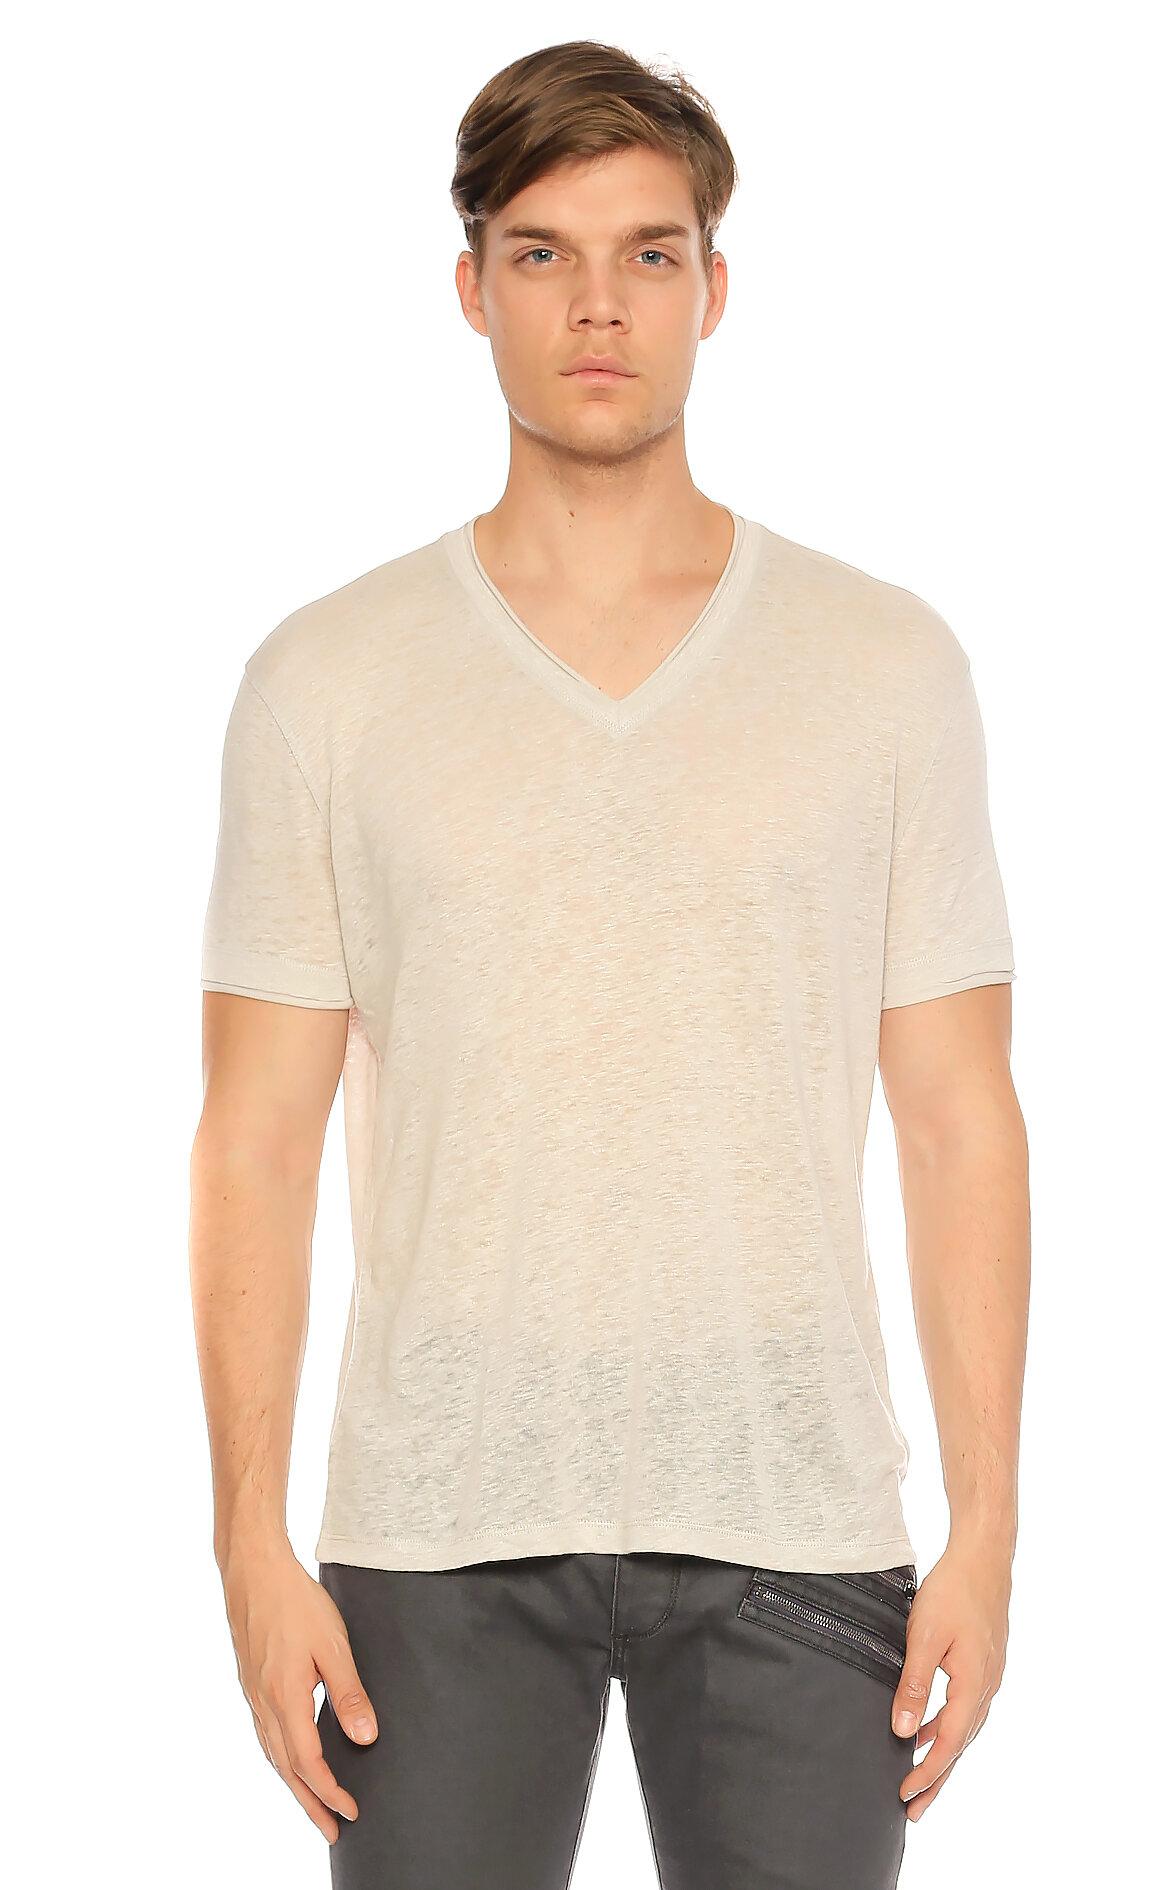 John Varvatos-John Varvatos V Yaka Bej Rengi T-Shirt